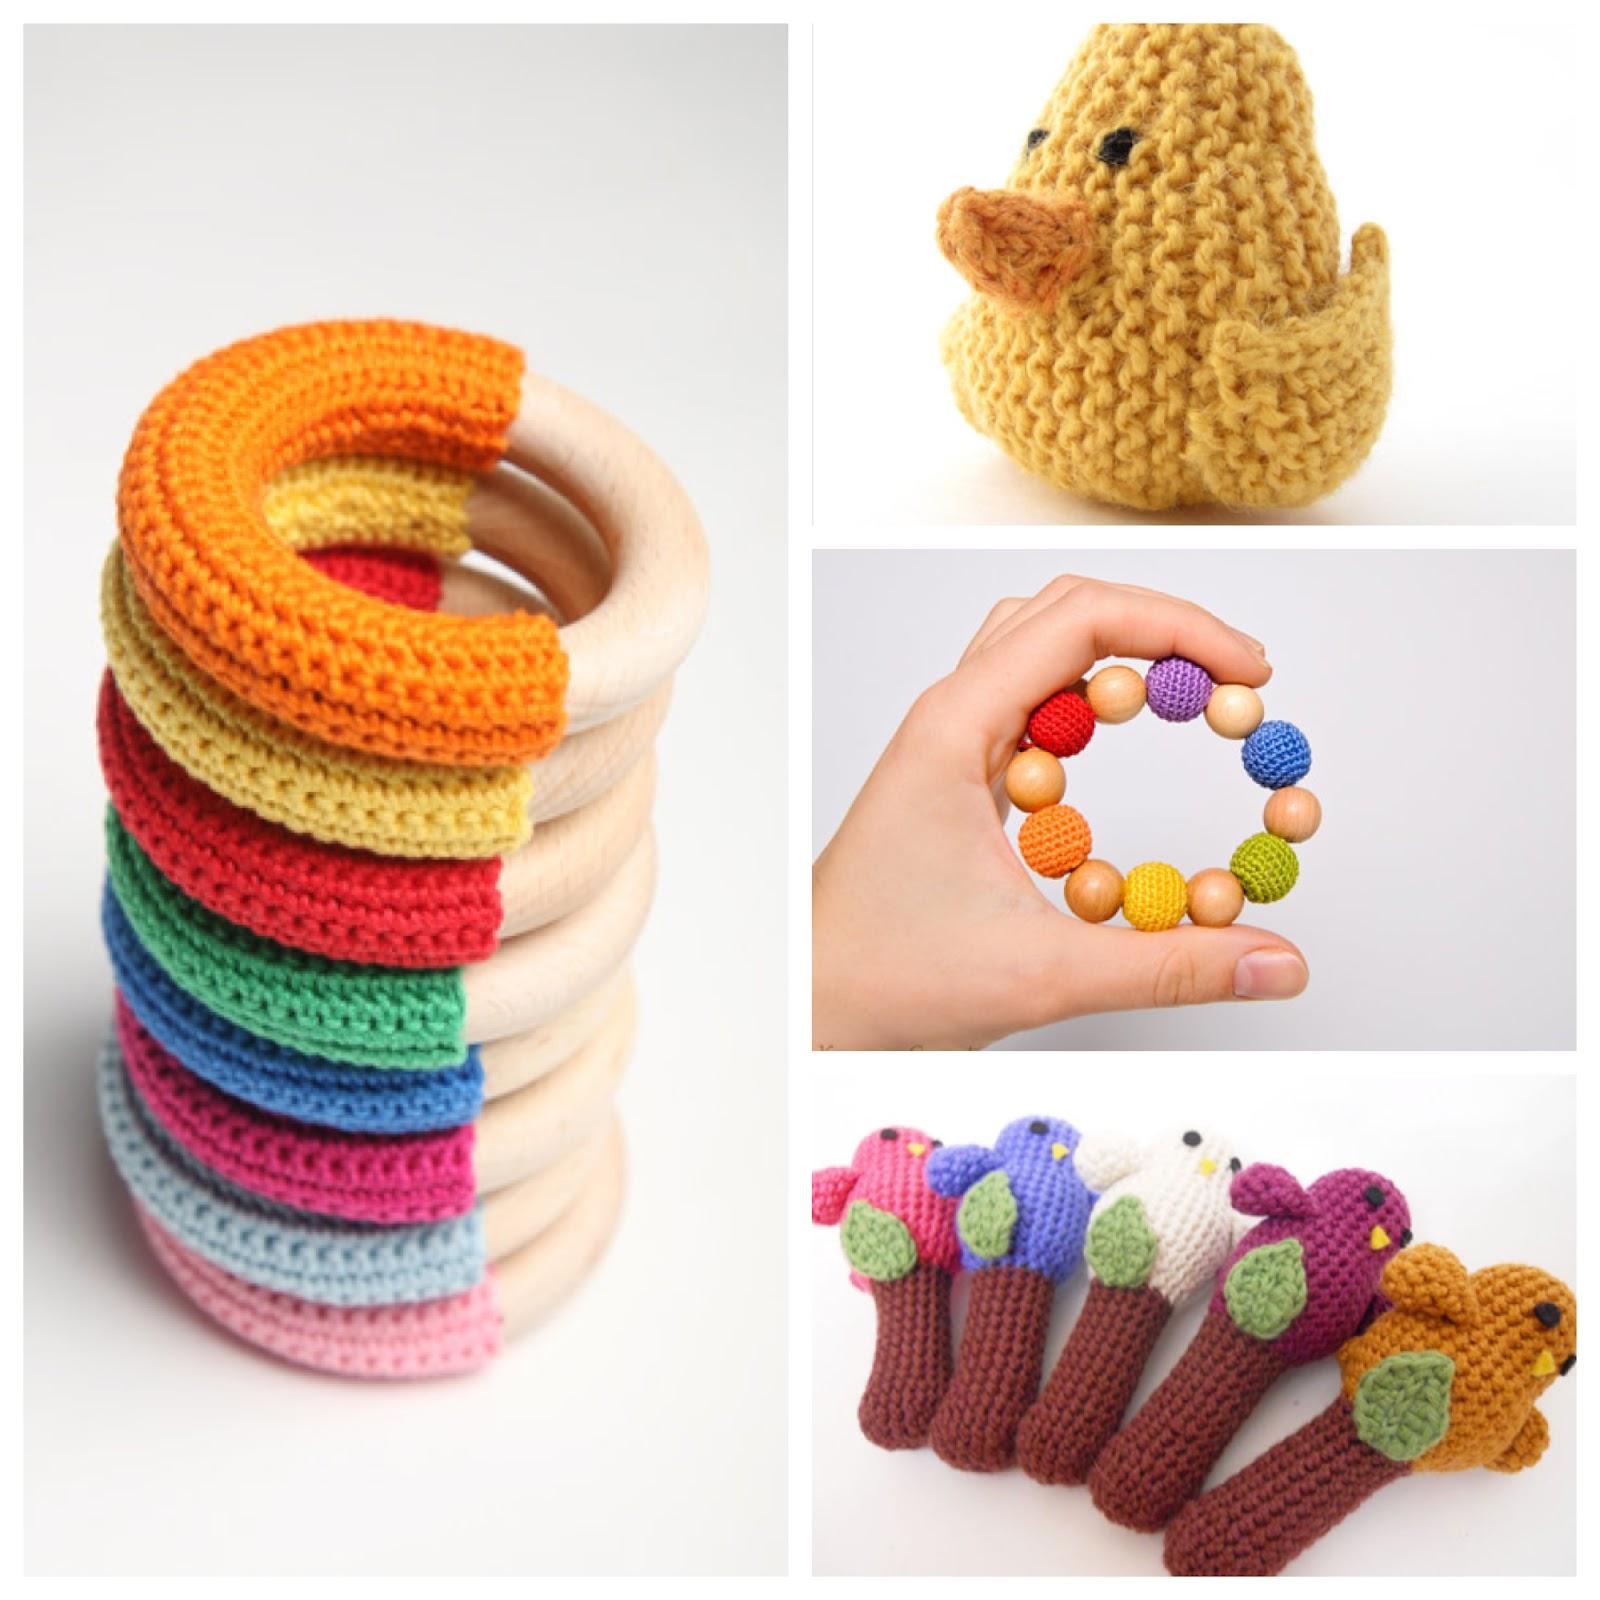 Knitting Patterns For Babies Toys : Mama Kalalu: June 2012